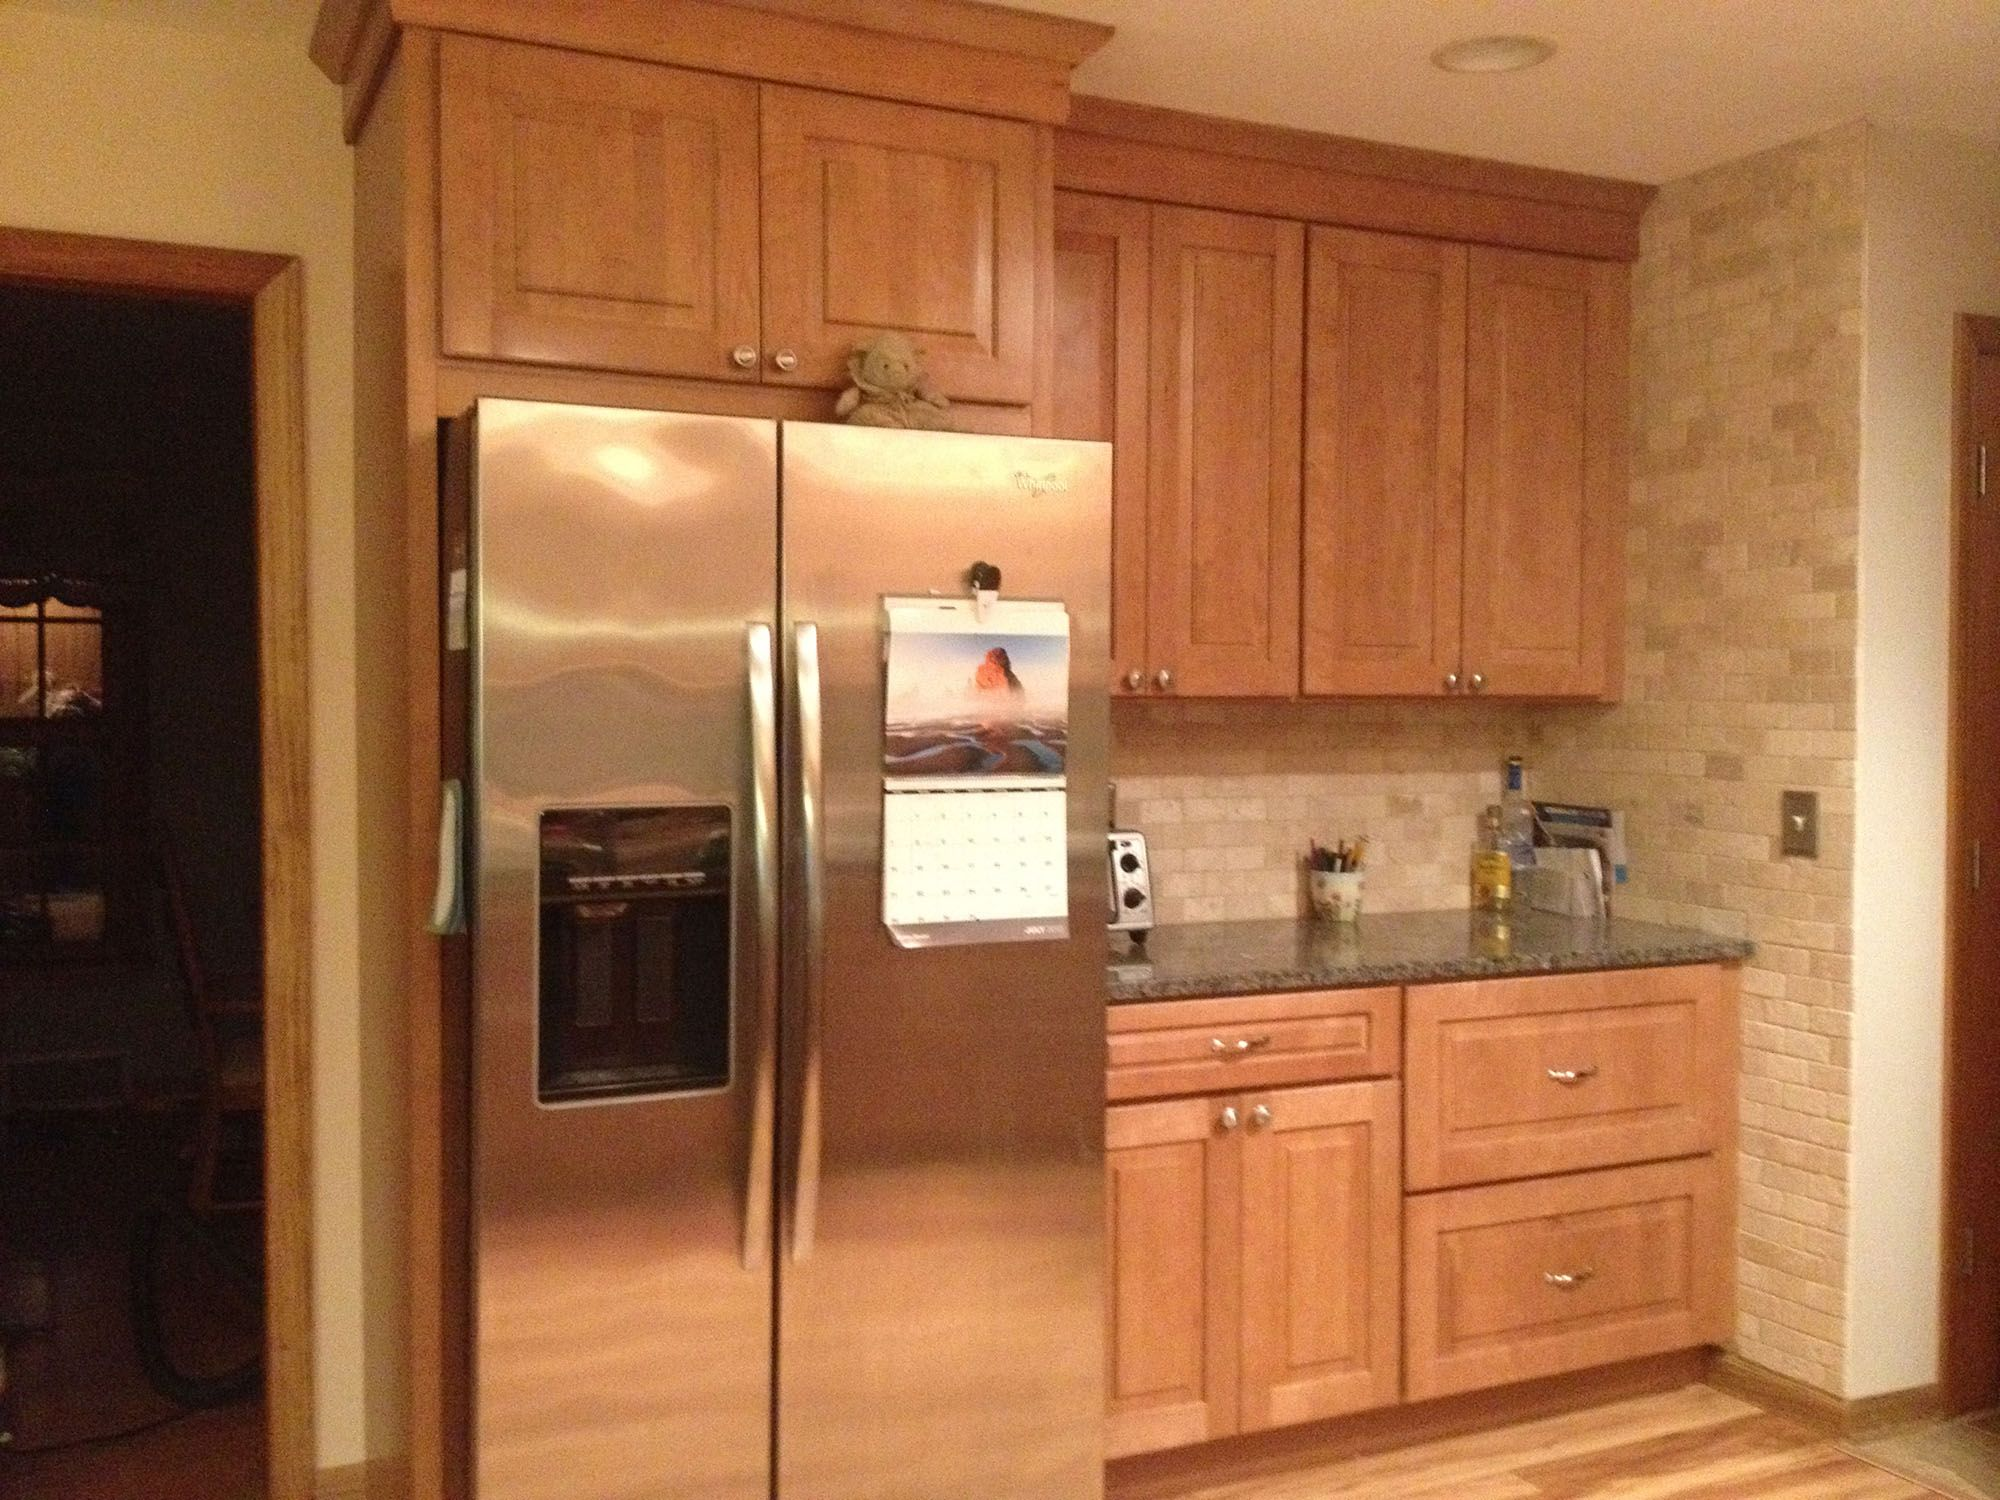 Kitchen Backsplash By Window large kitchen has semi custom maple cabinets in a shaker style